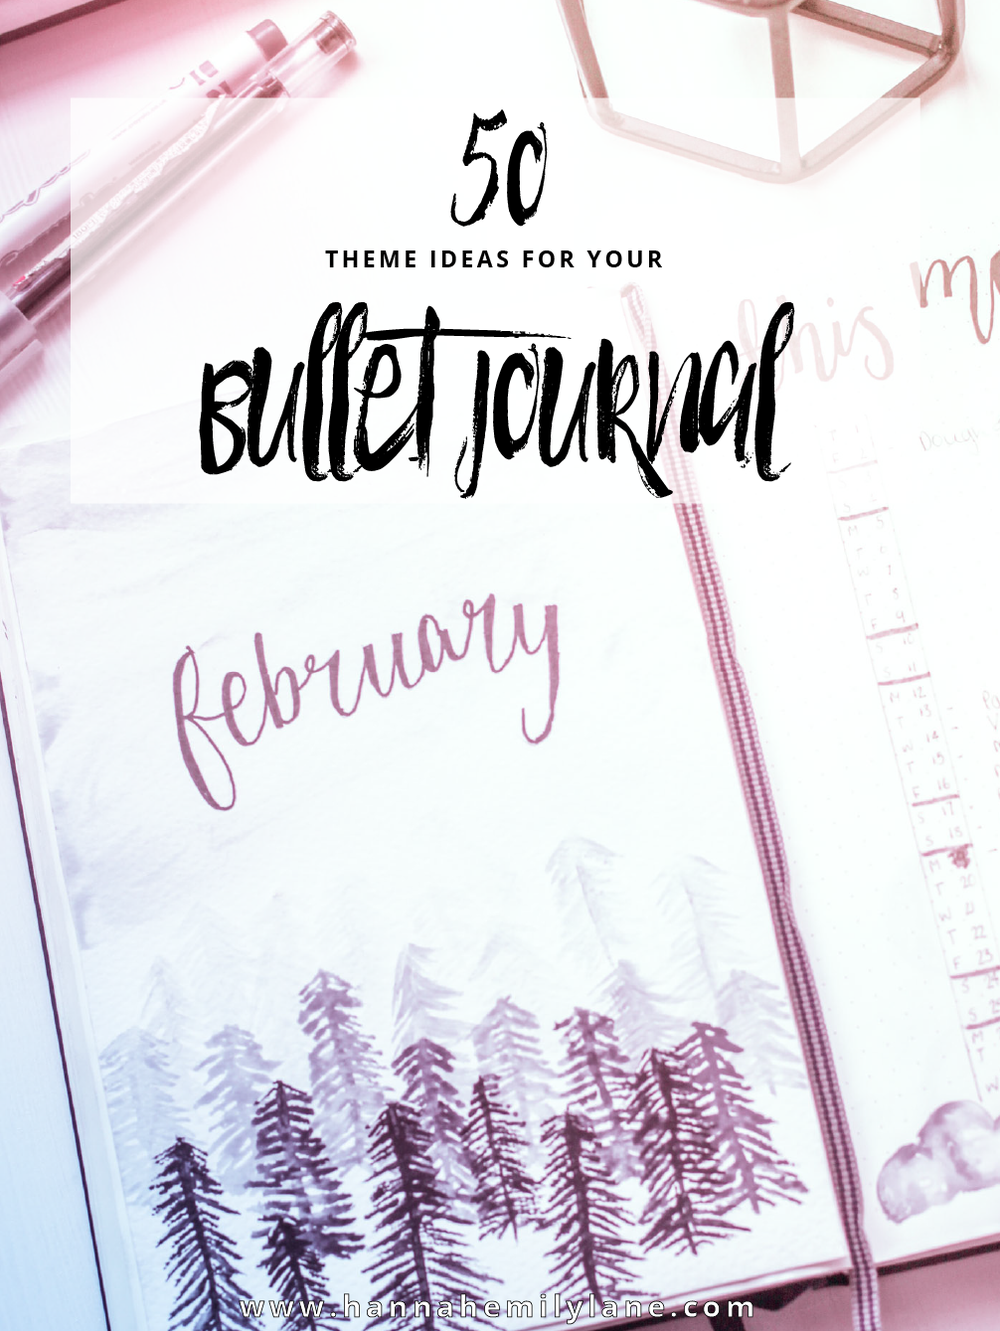 50 Monthly Theme Ideas for your Bullet Journal | www.hannahemilylane.com